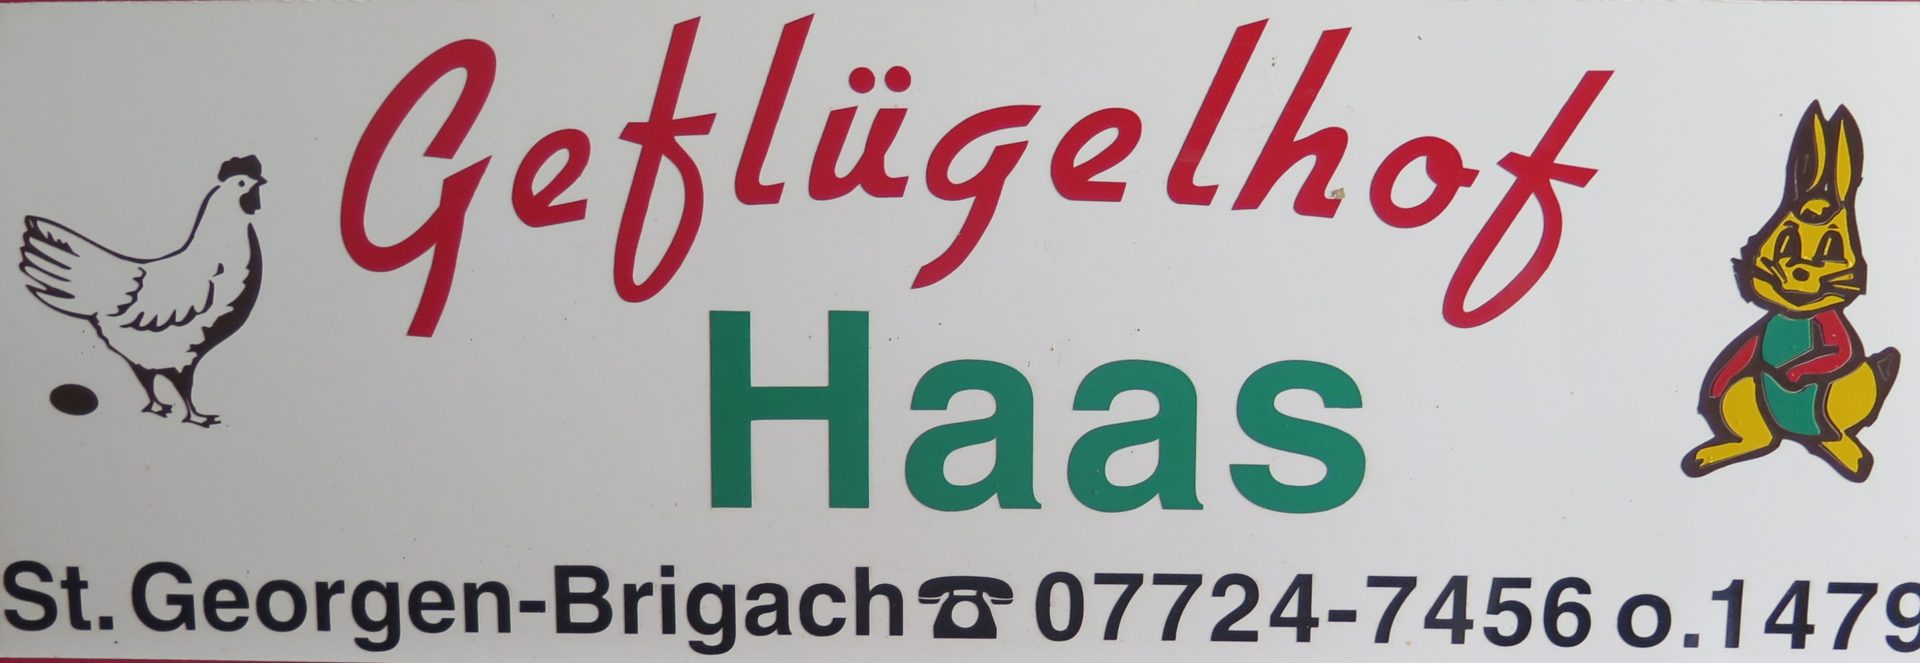 Geflügelhof Haas Logo